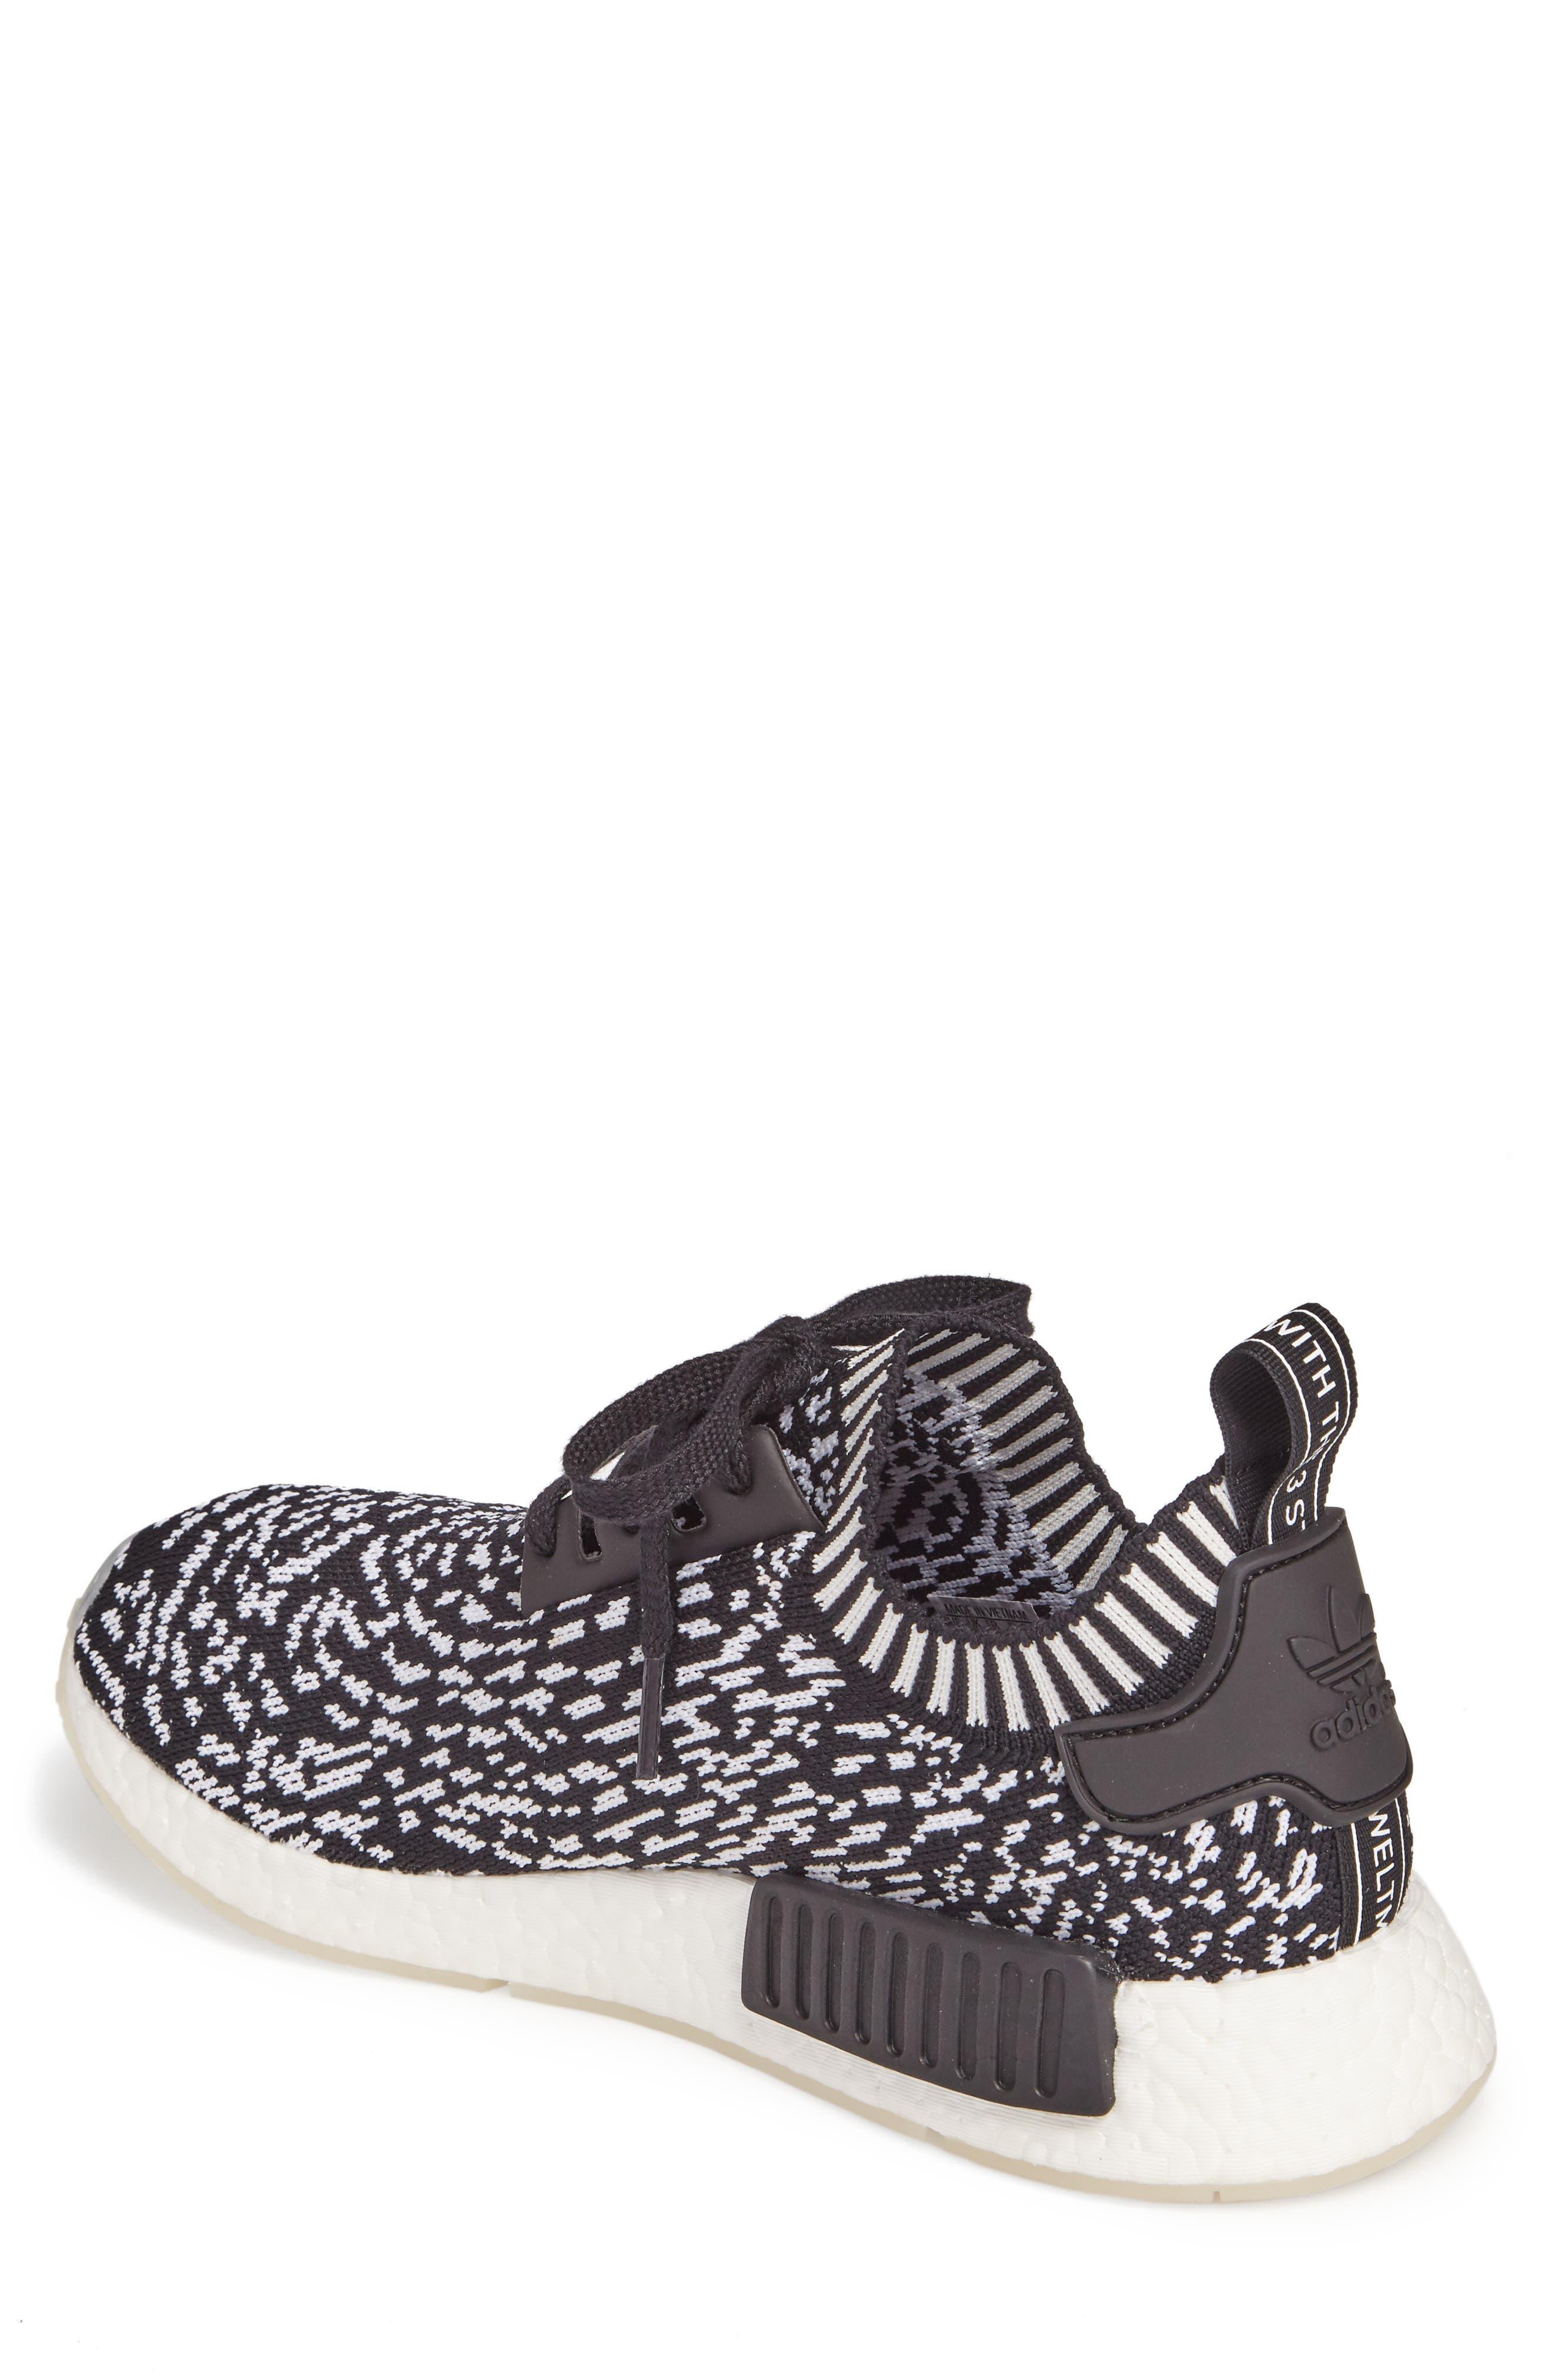 NMD R1 Primeknit Sneaker,                             Alternate thumbnail 2, color,                             Core Black/ Core Black/ White